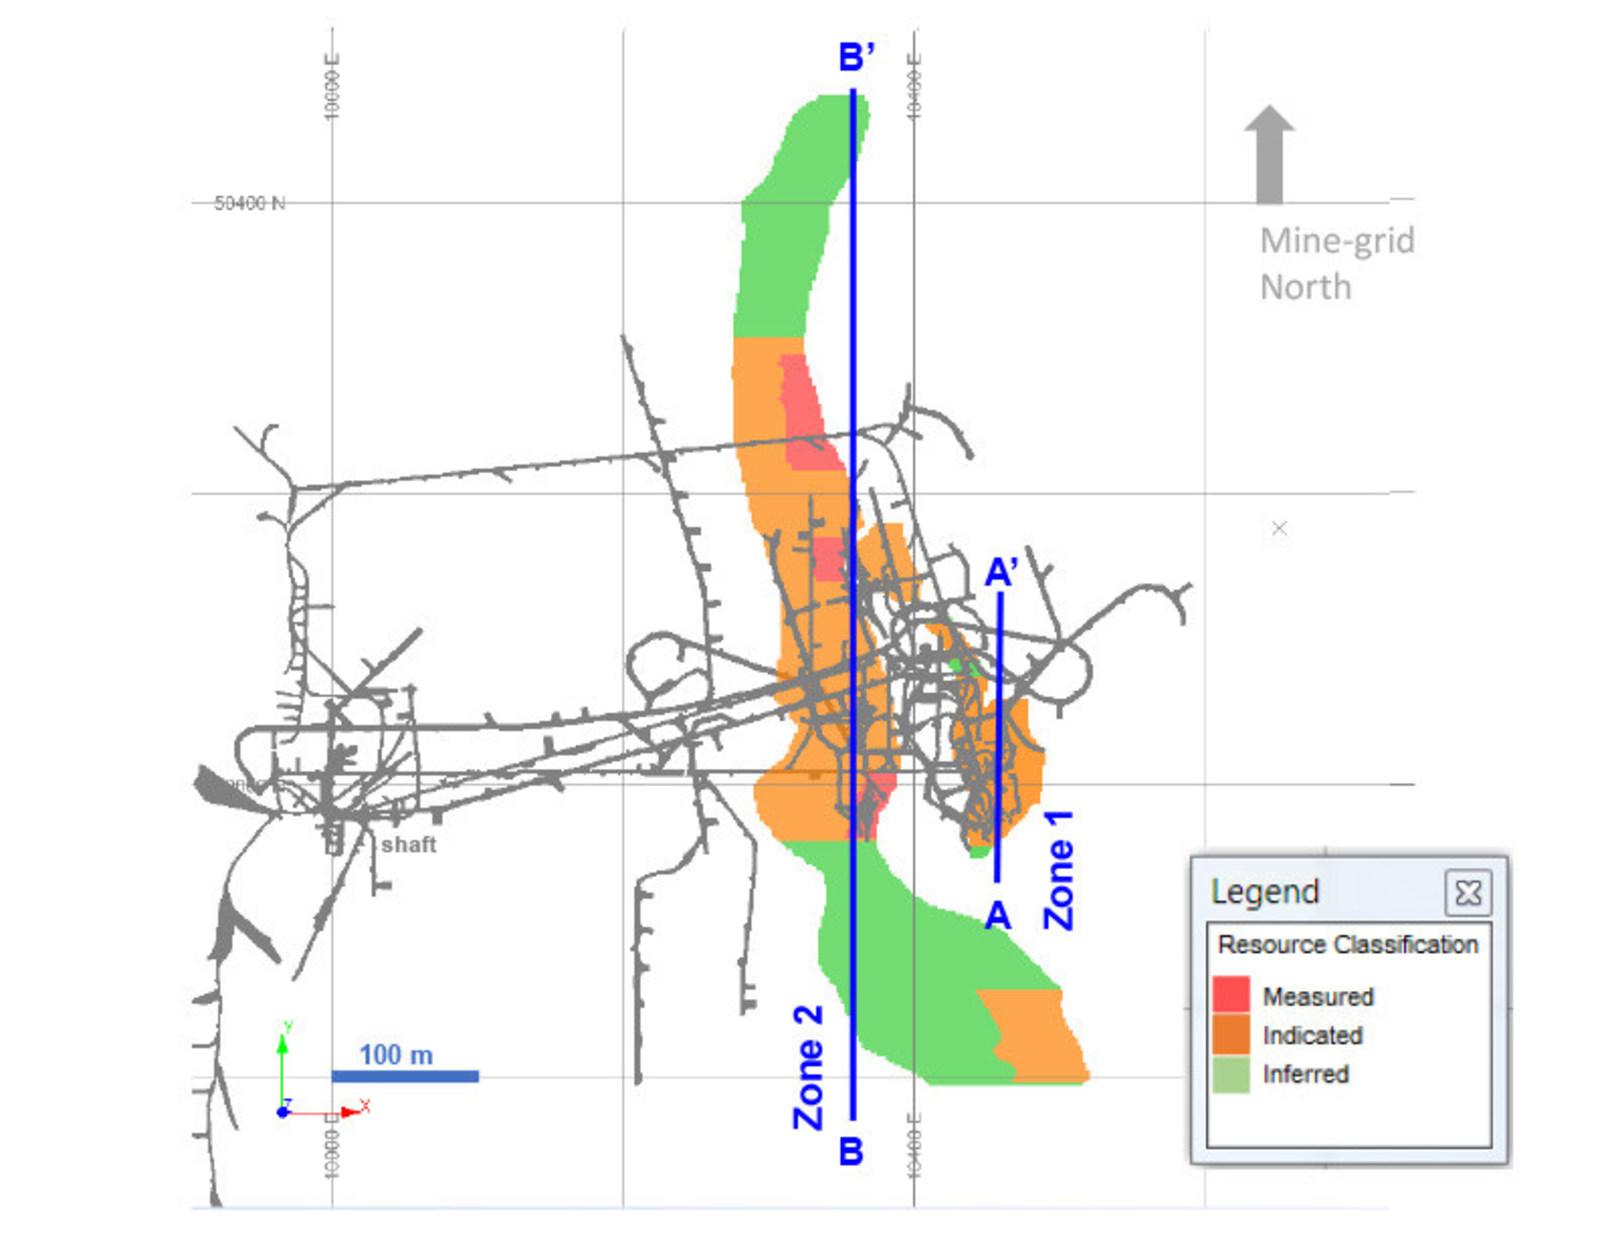 Diagram 1: 2018 Mineral Resource Estimate at 3.0 g/t Au Cut-off Grade – Plan View 305-metre level